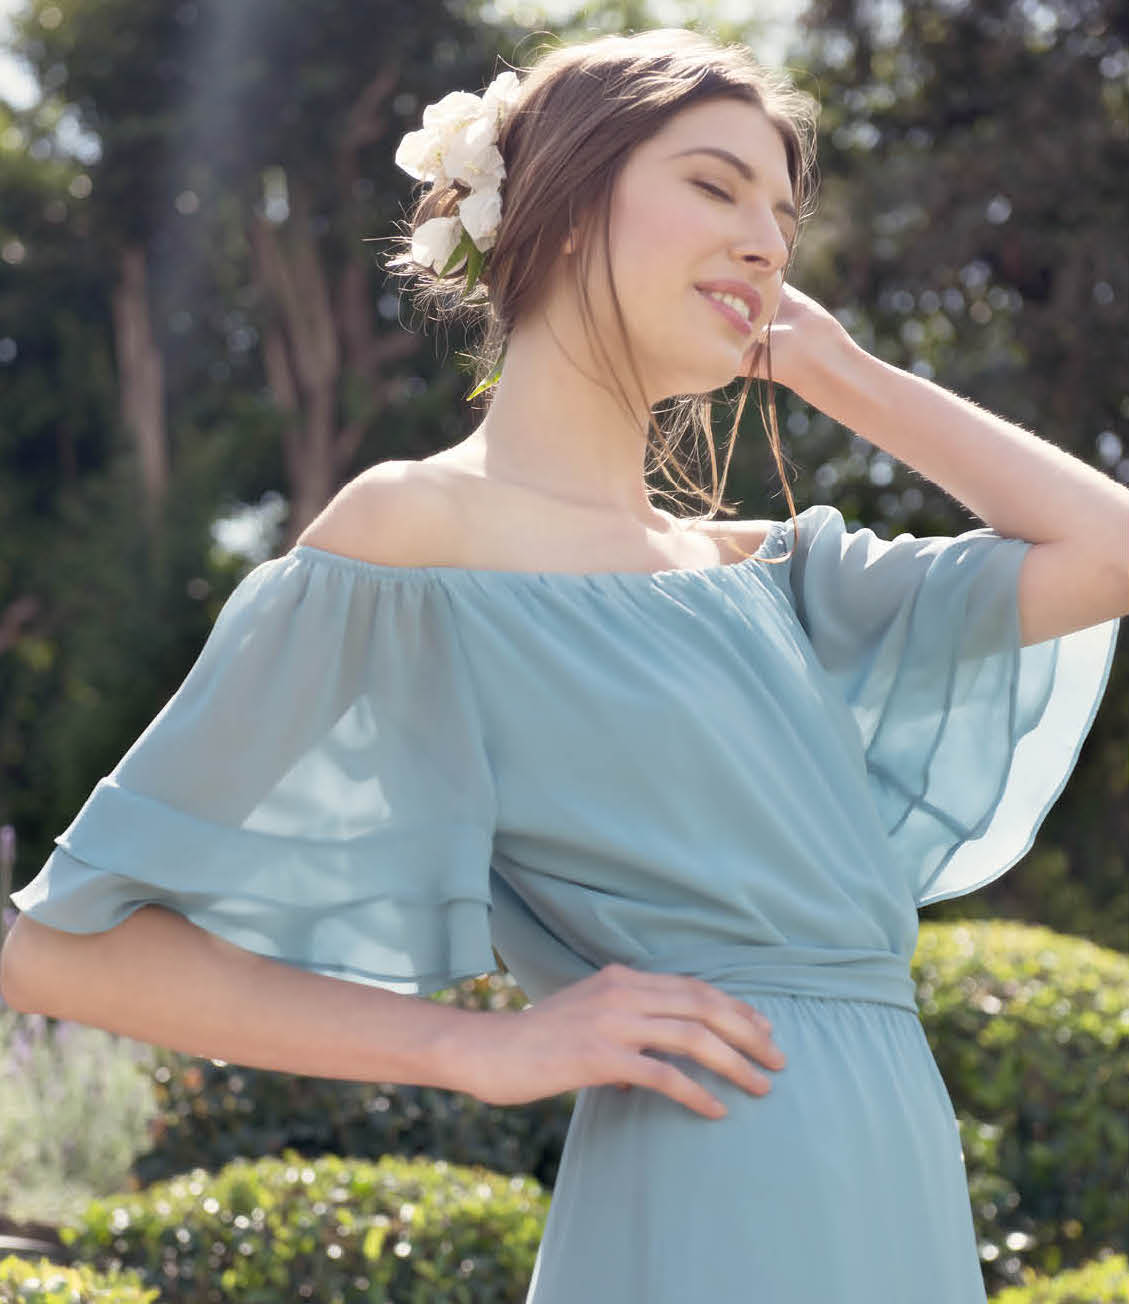 ivory-and-beau-savannah-weddings-off-shuolder-bridesmaids-dresses-dress-wedding-inspo-bridesmaids-inspo-blue-garden-weddings-JoannaAugust_Lookbook_WonHouse9 (1).jpg